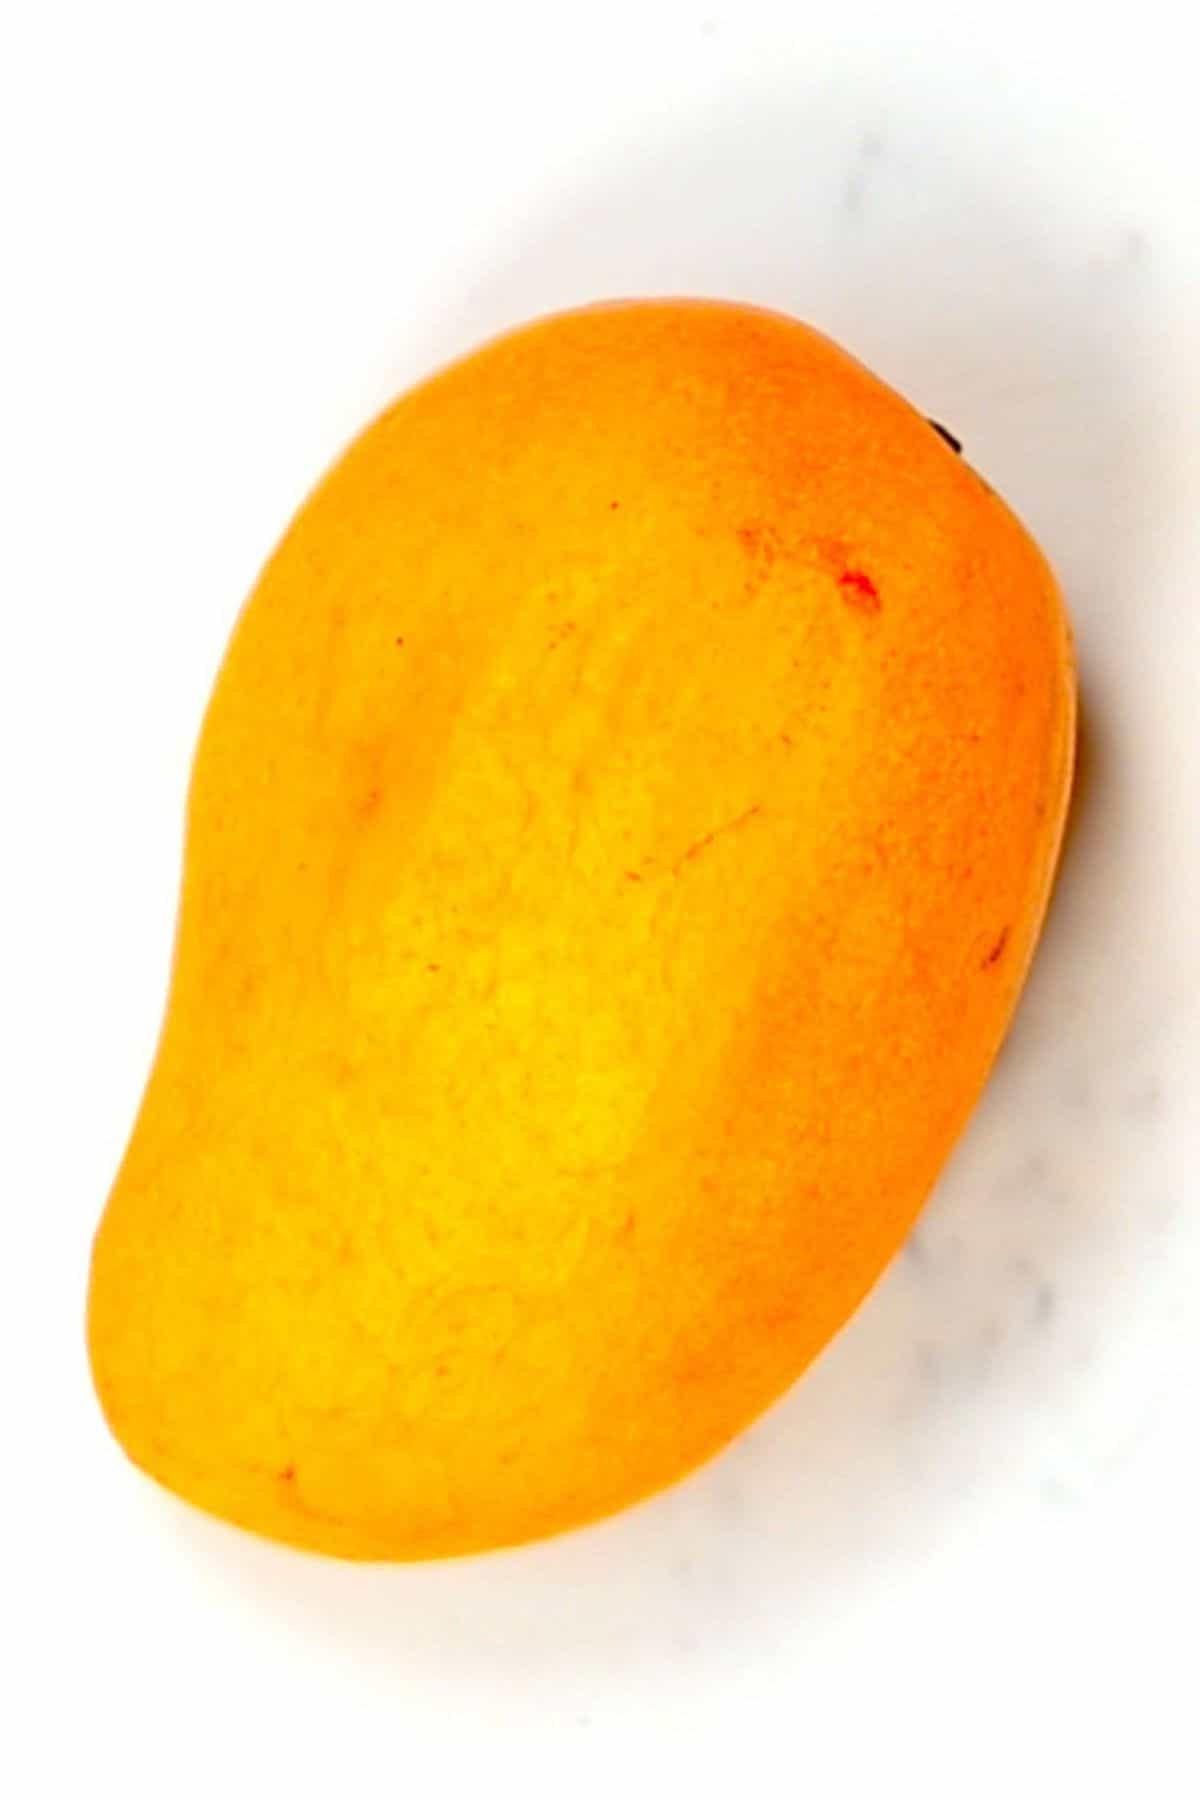 Yellow mango fruit